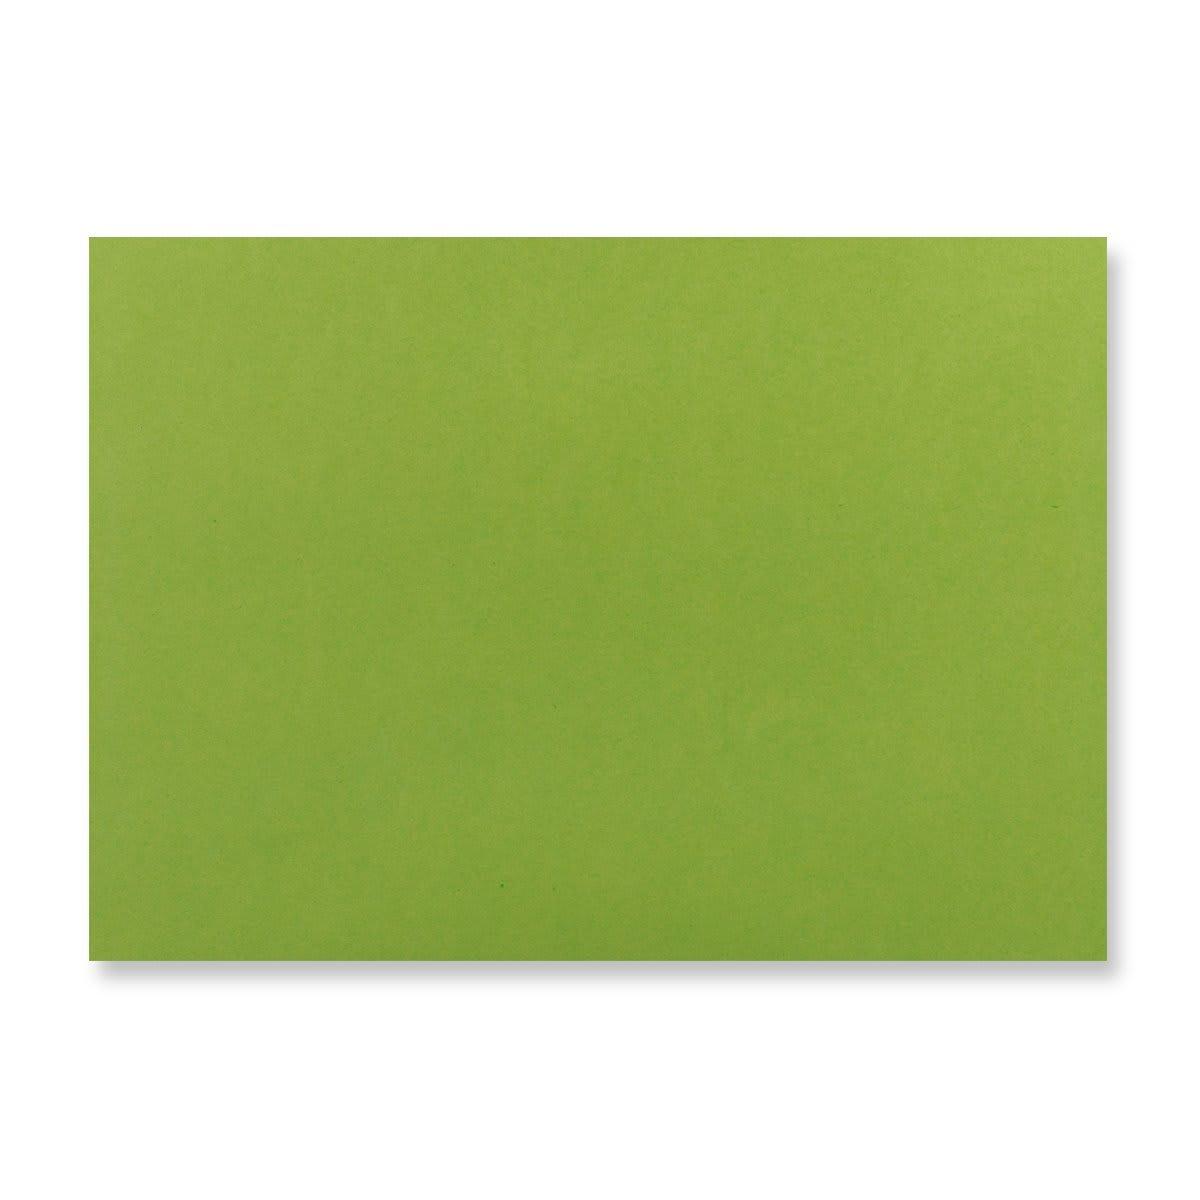 C6 GREEN V-FLAP PEEL AND SEAL ENVELOPES